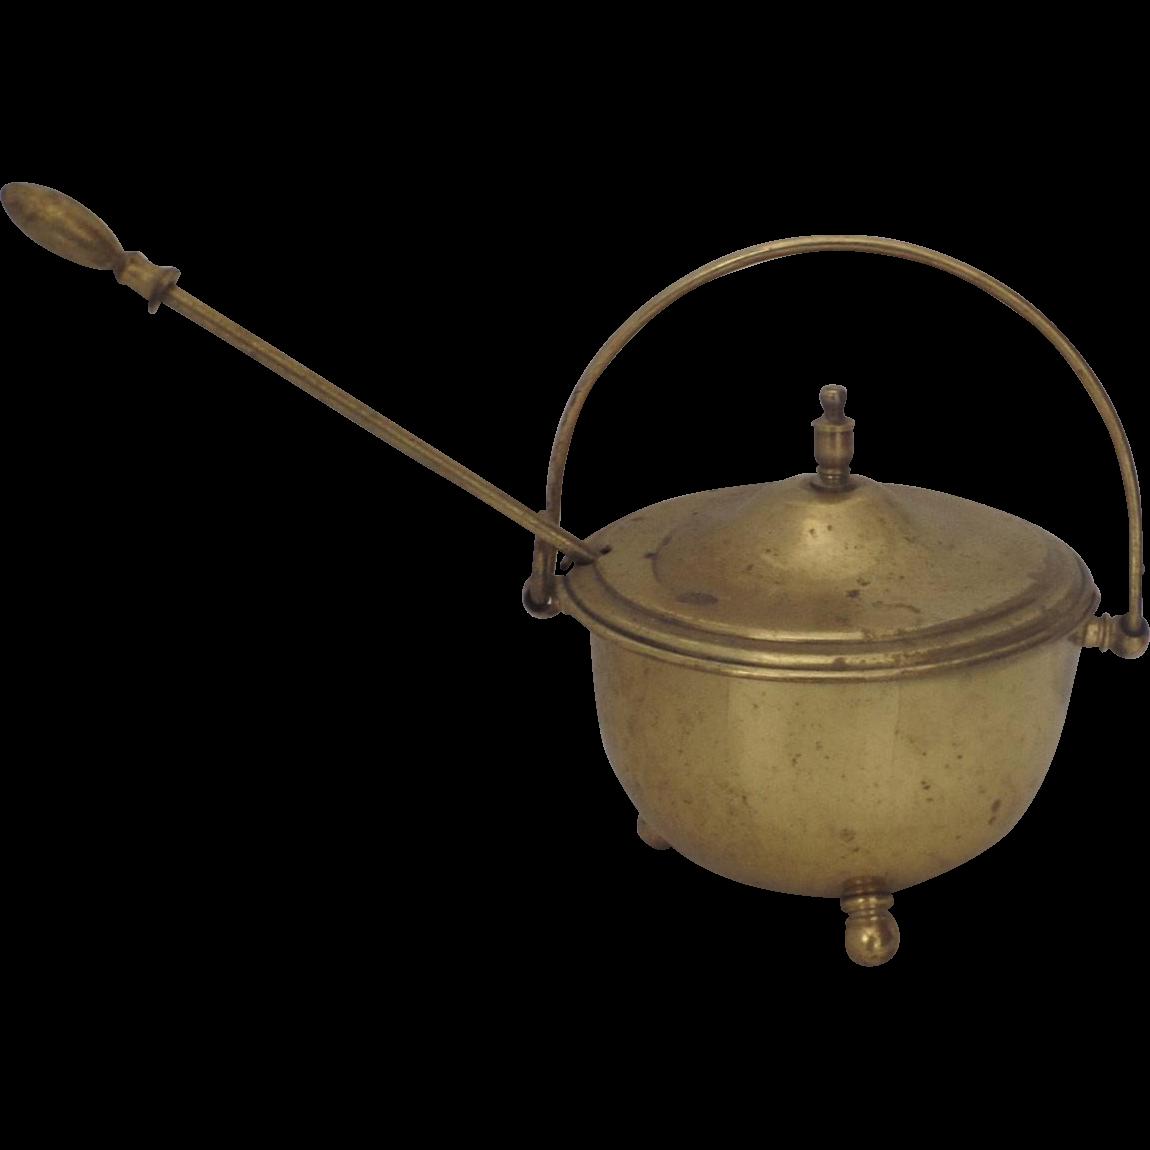 vintage brass smudge pot fire starter fireplace from blacktulip on